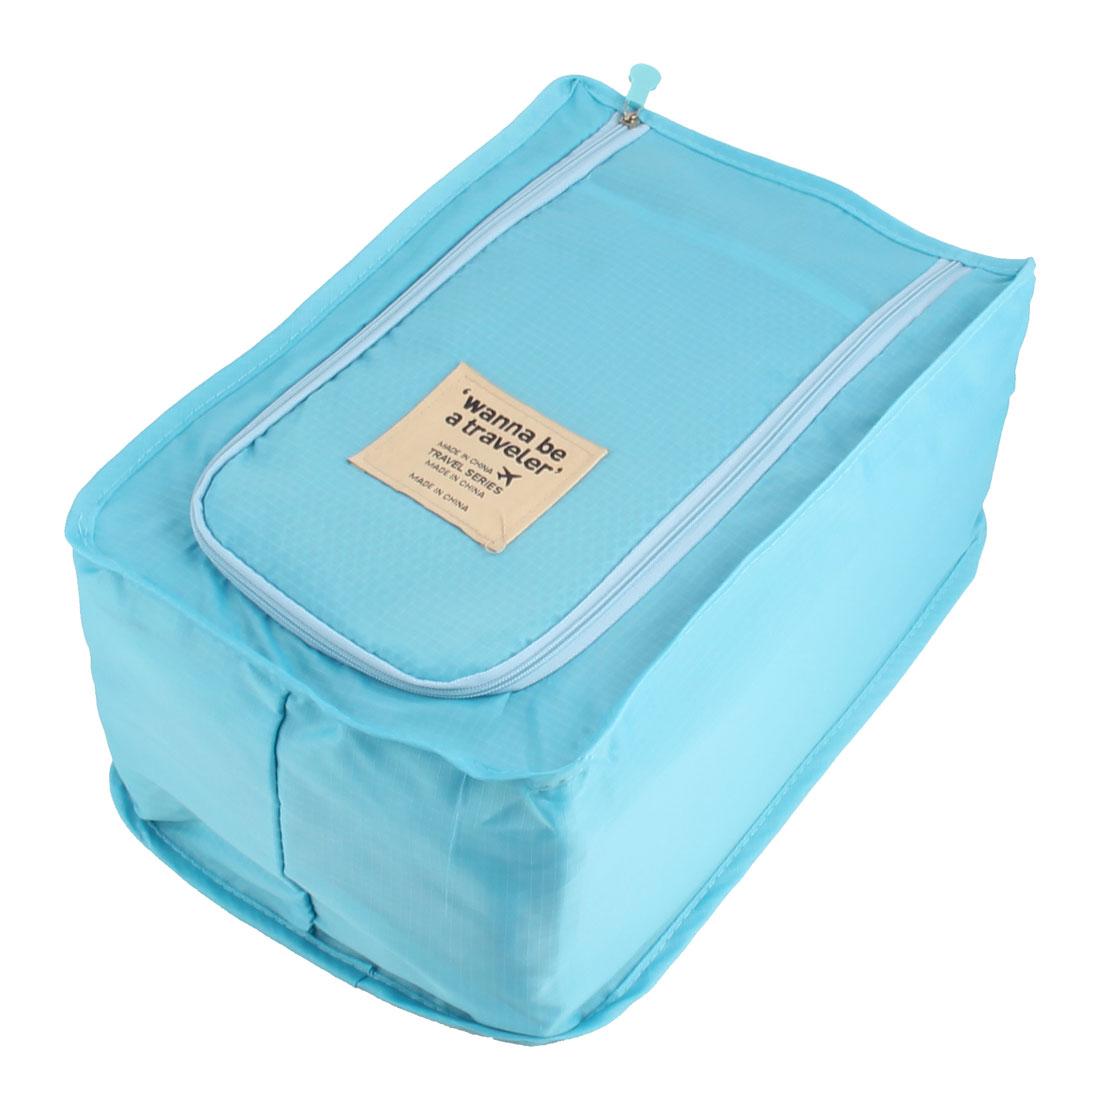 Travel Trip Foldable Zipper Closure Shoes Sneaker Slipper Packing Organizer Storage Bag Case Sky Blue